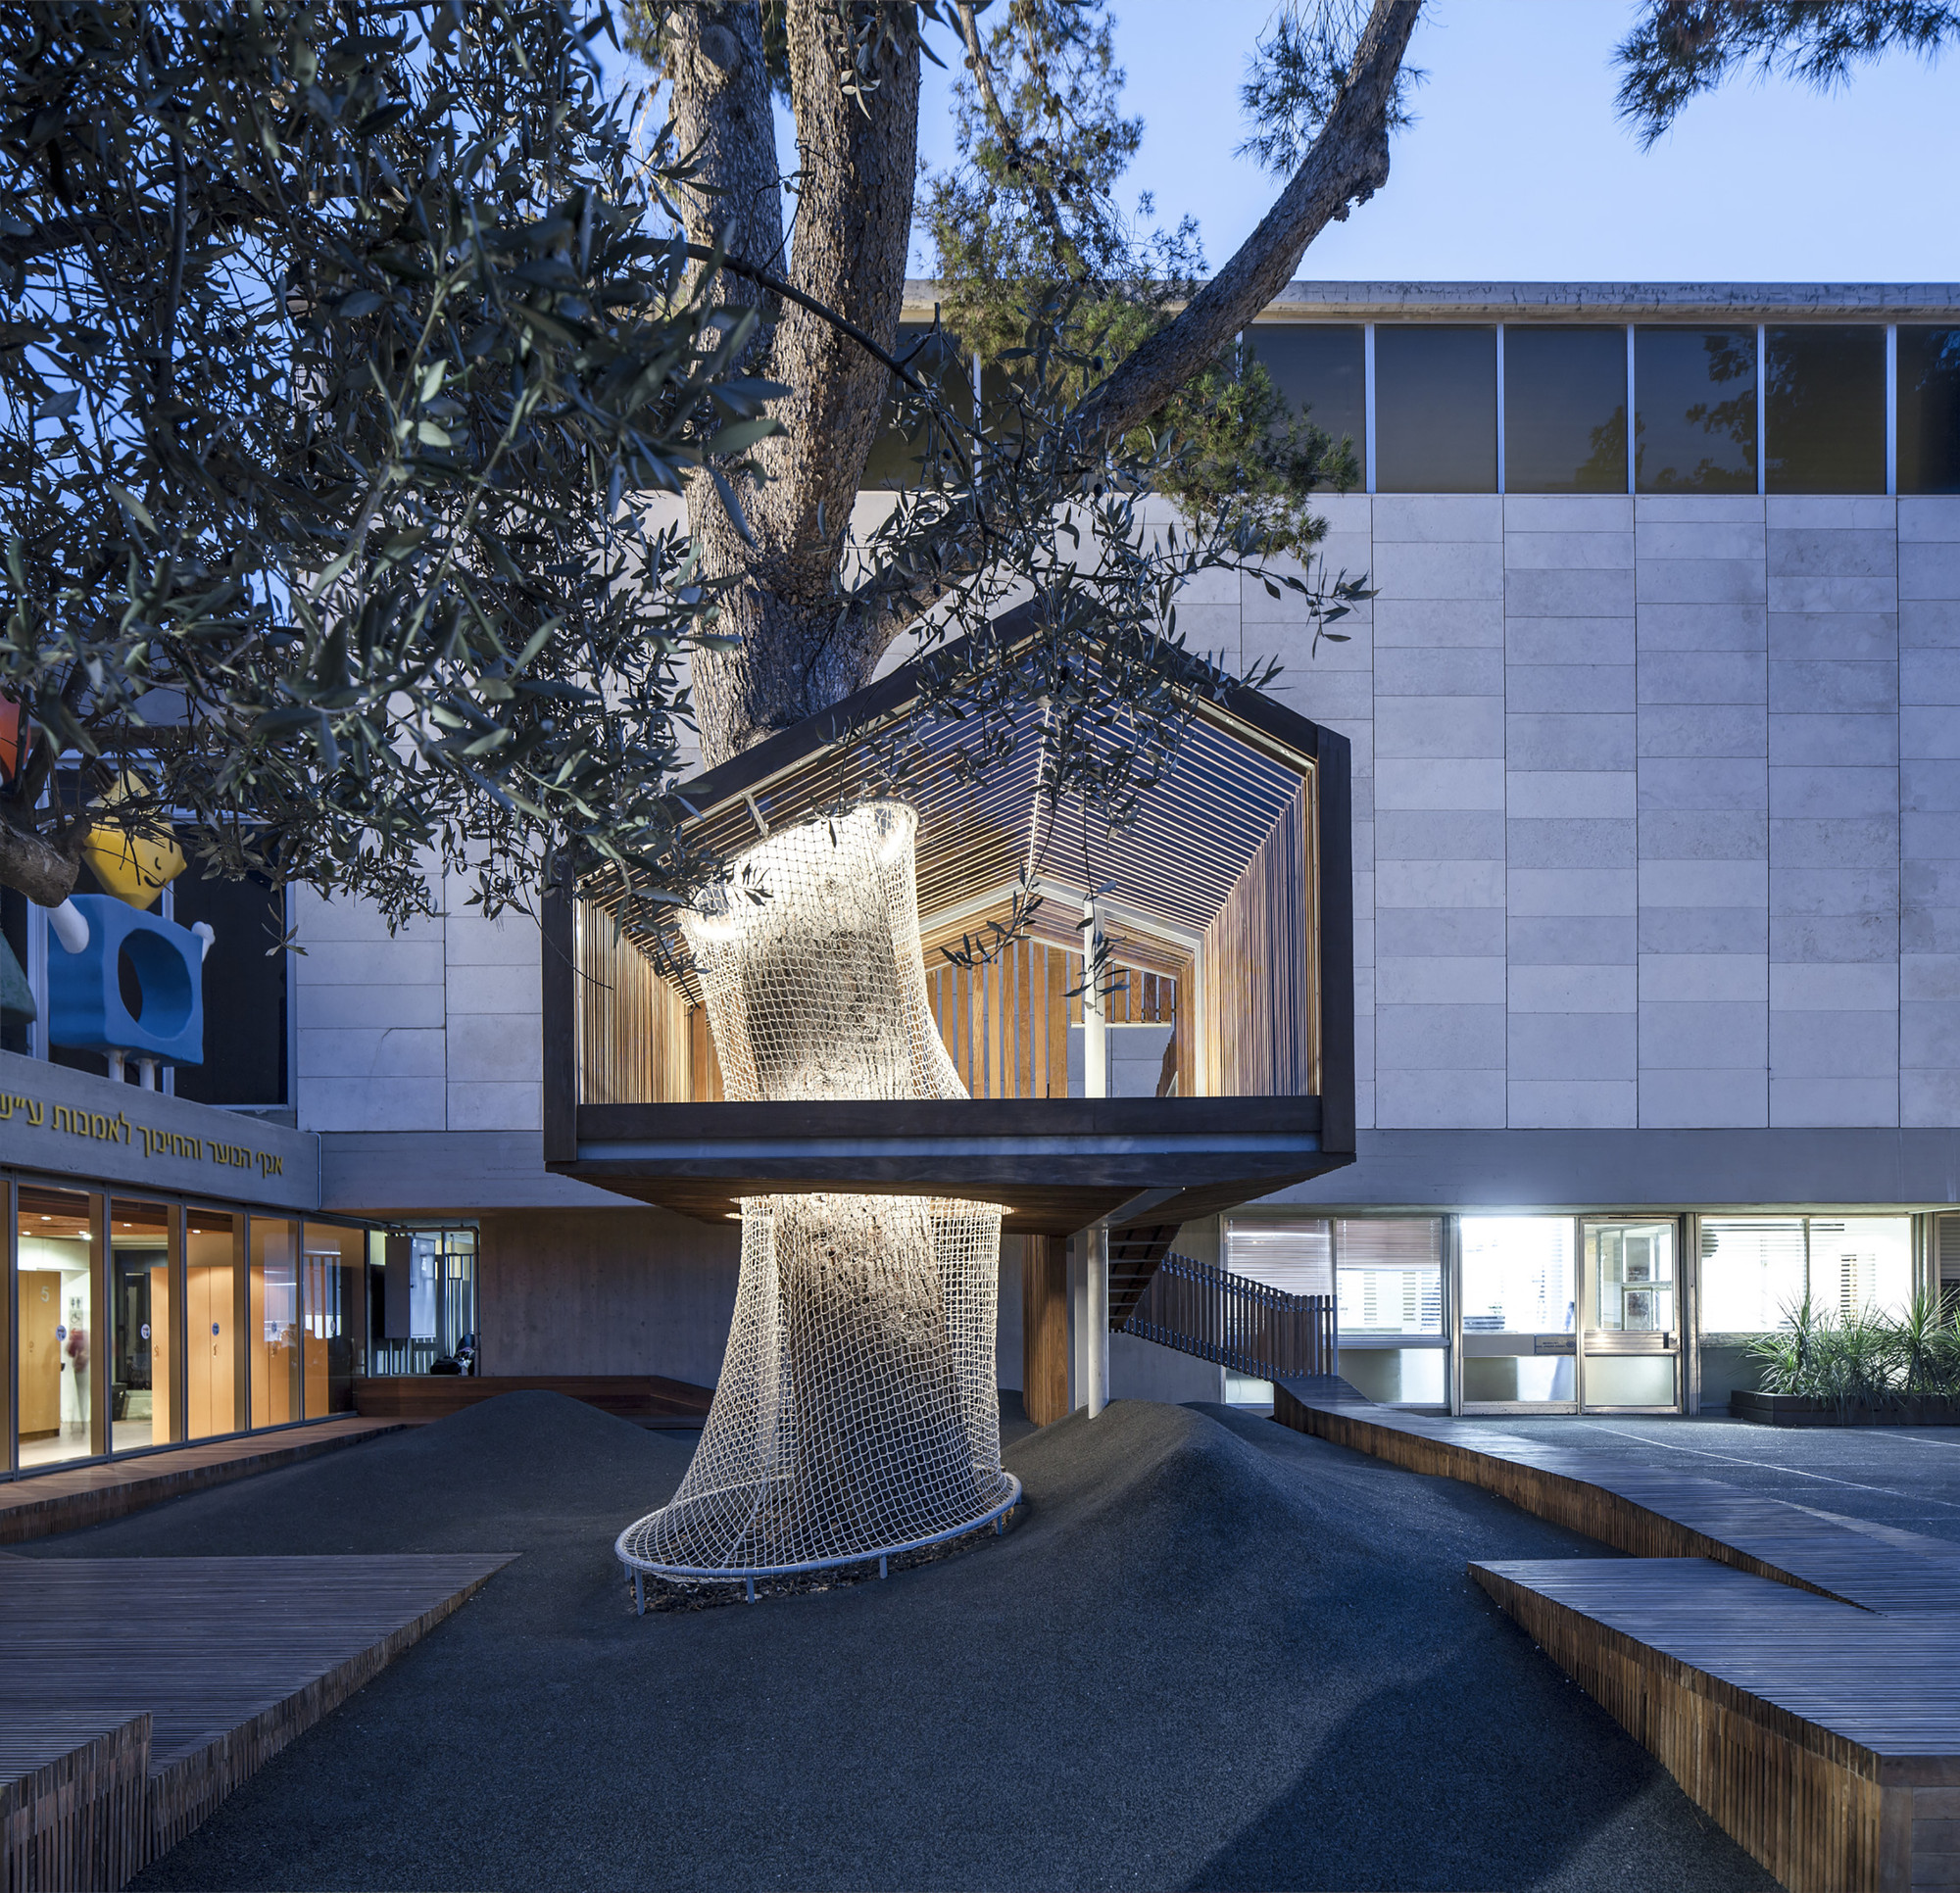 The Youth Wing for Art Education Entrance Courtyard  / Ifat Finkelman + Deborah Warschawski , © Amit Geron